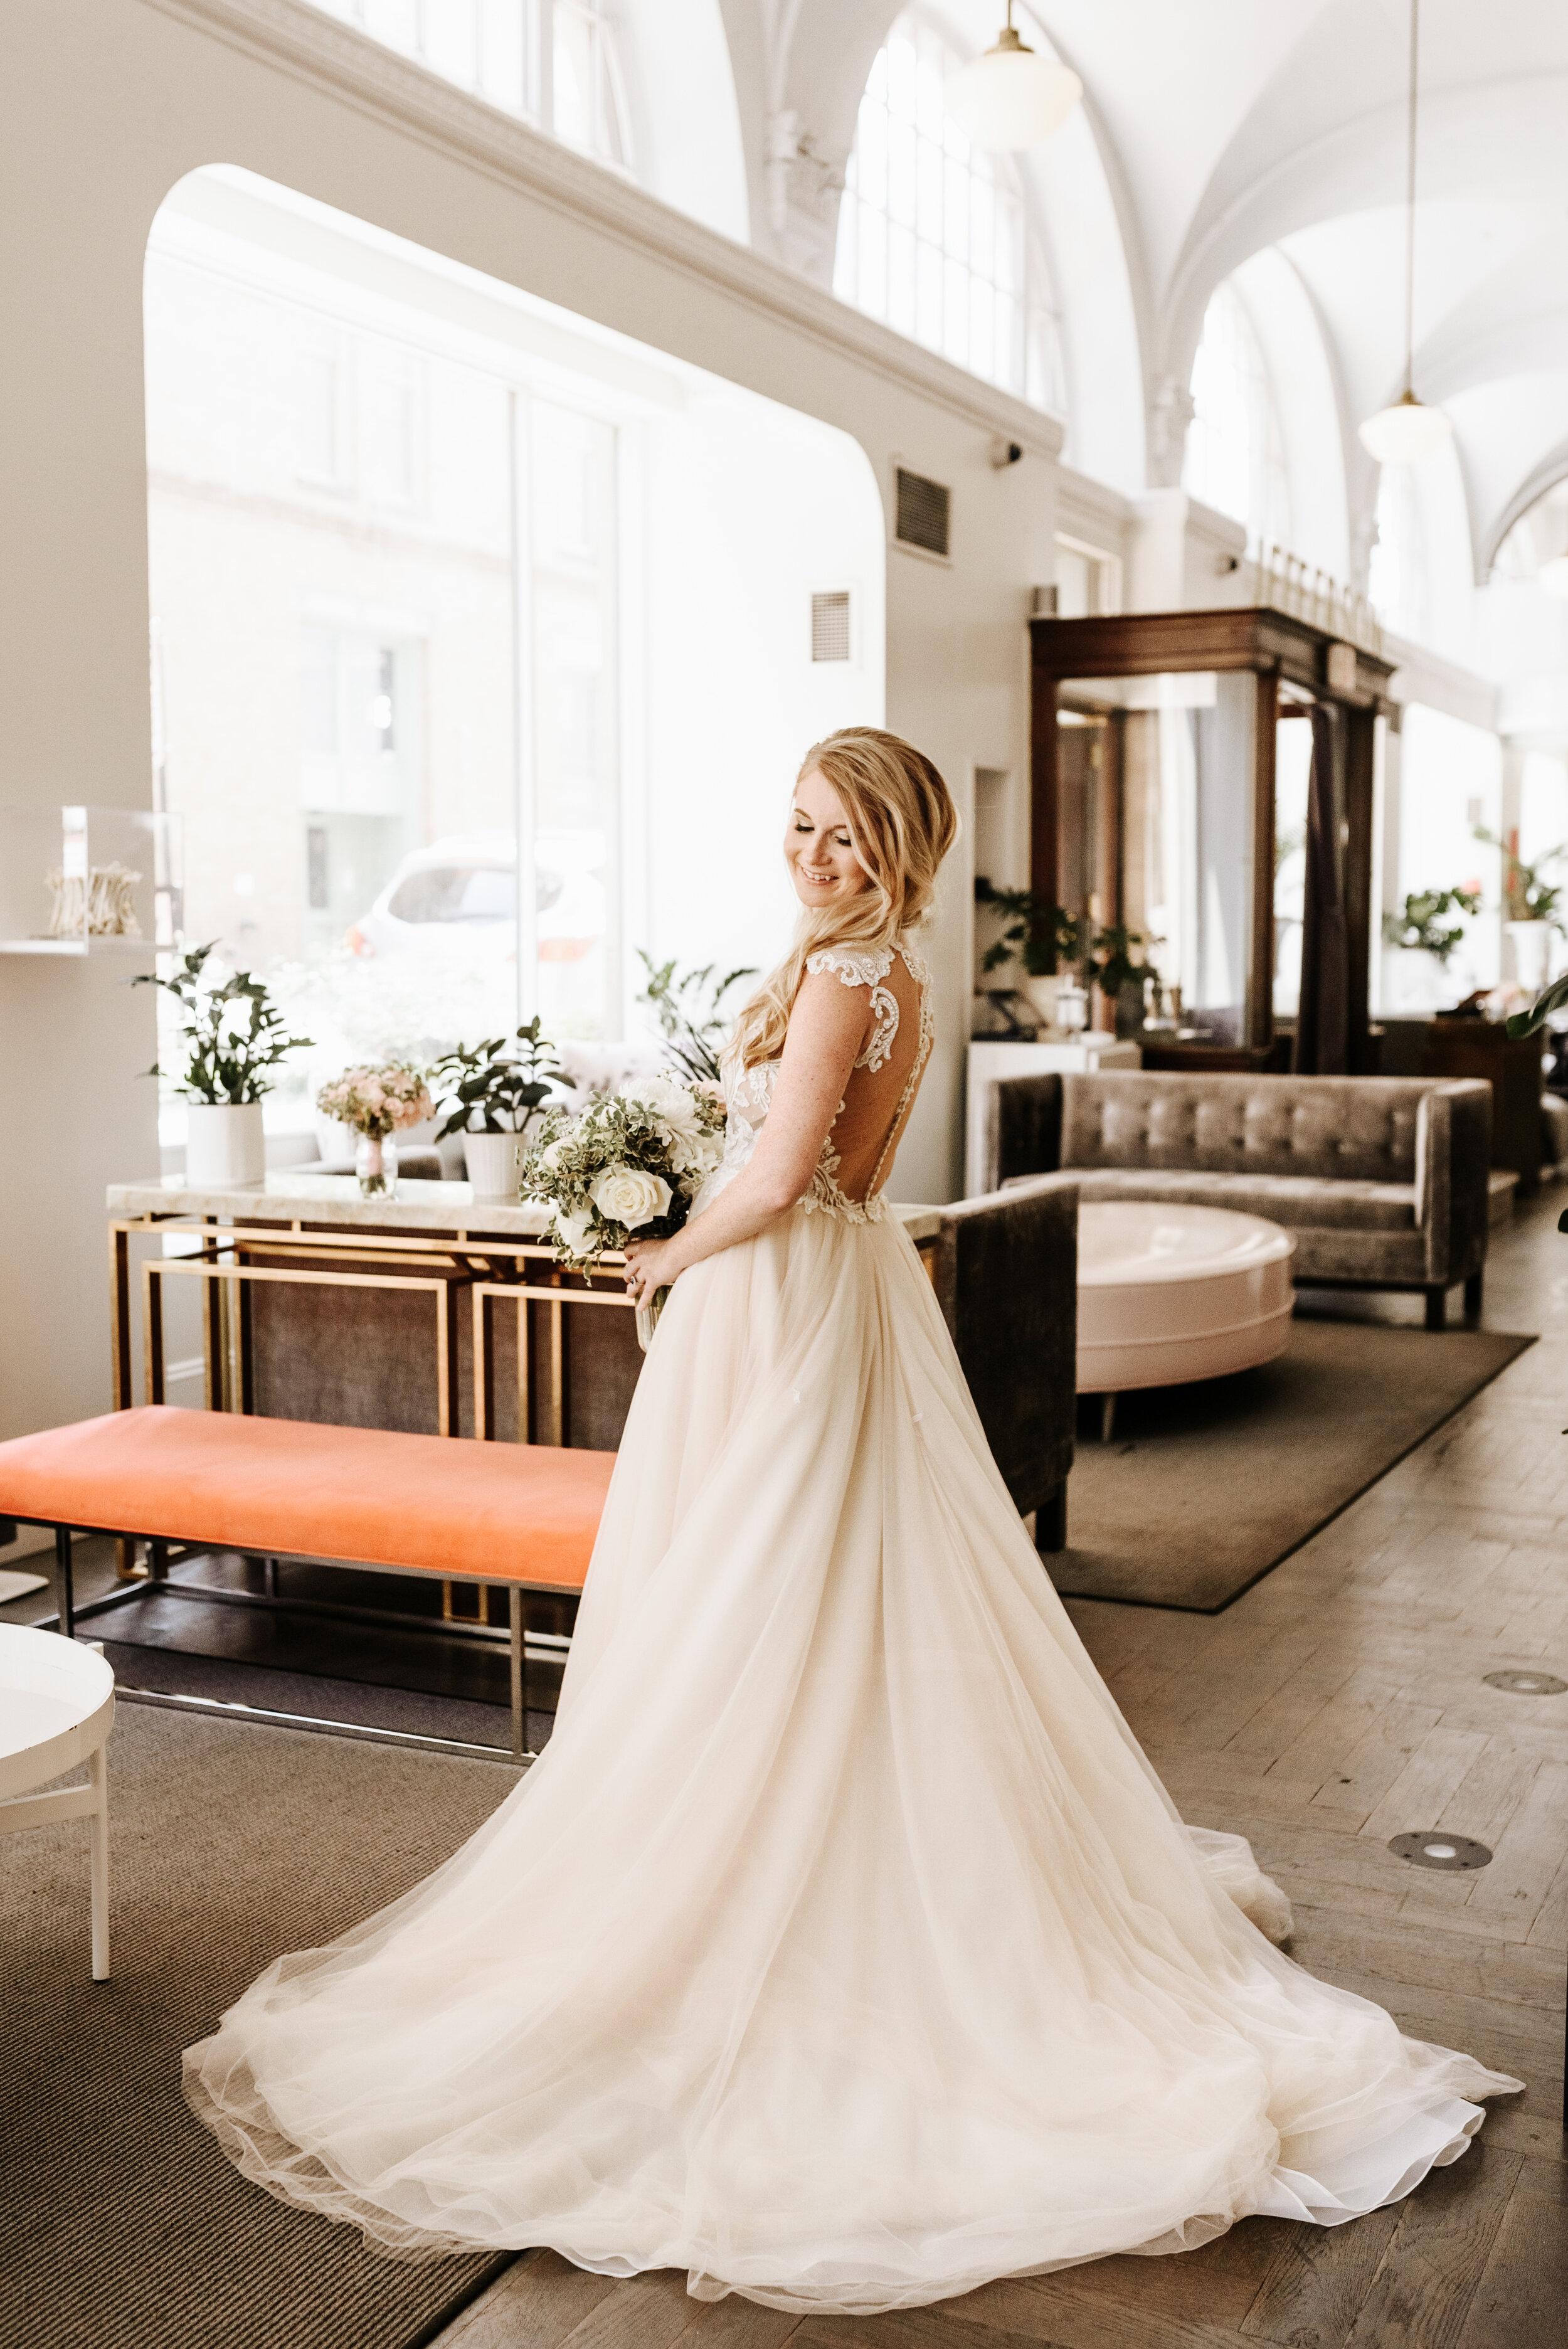 Cassie-Mrunal-Wedding-Quirk-Hotel-John-Marshall-Ballrooms-Richmond-Virginia-Photography-by-V-23.jpg